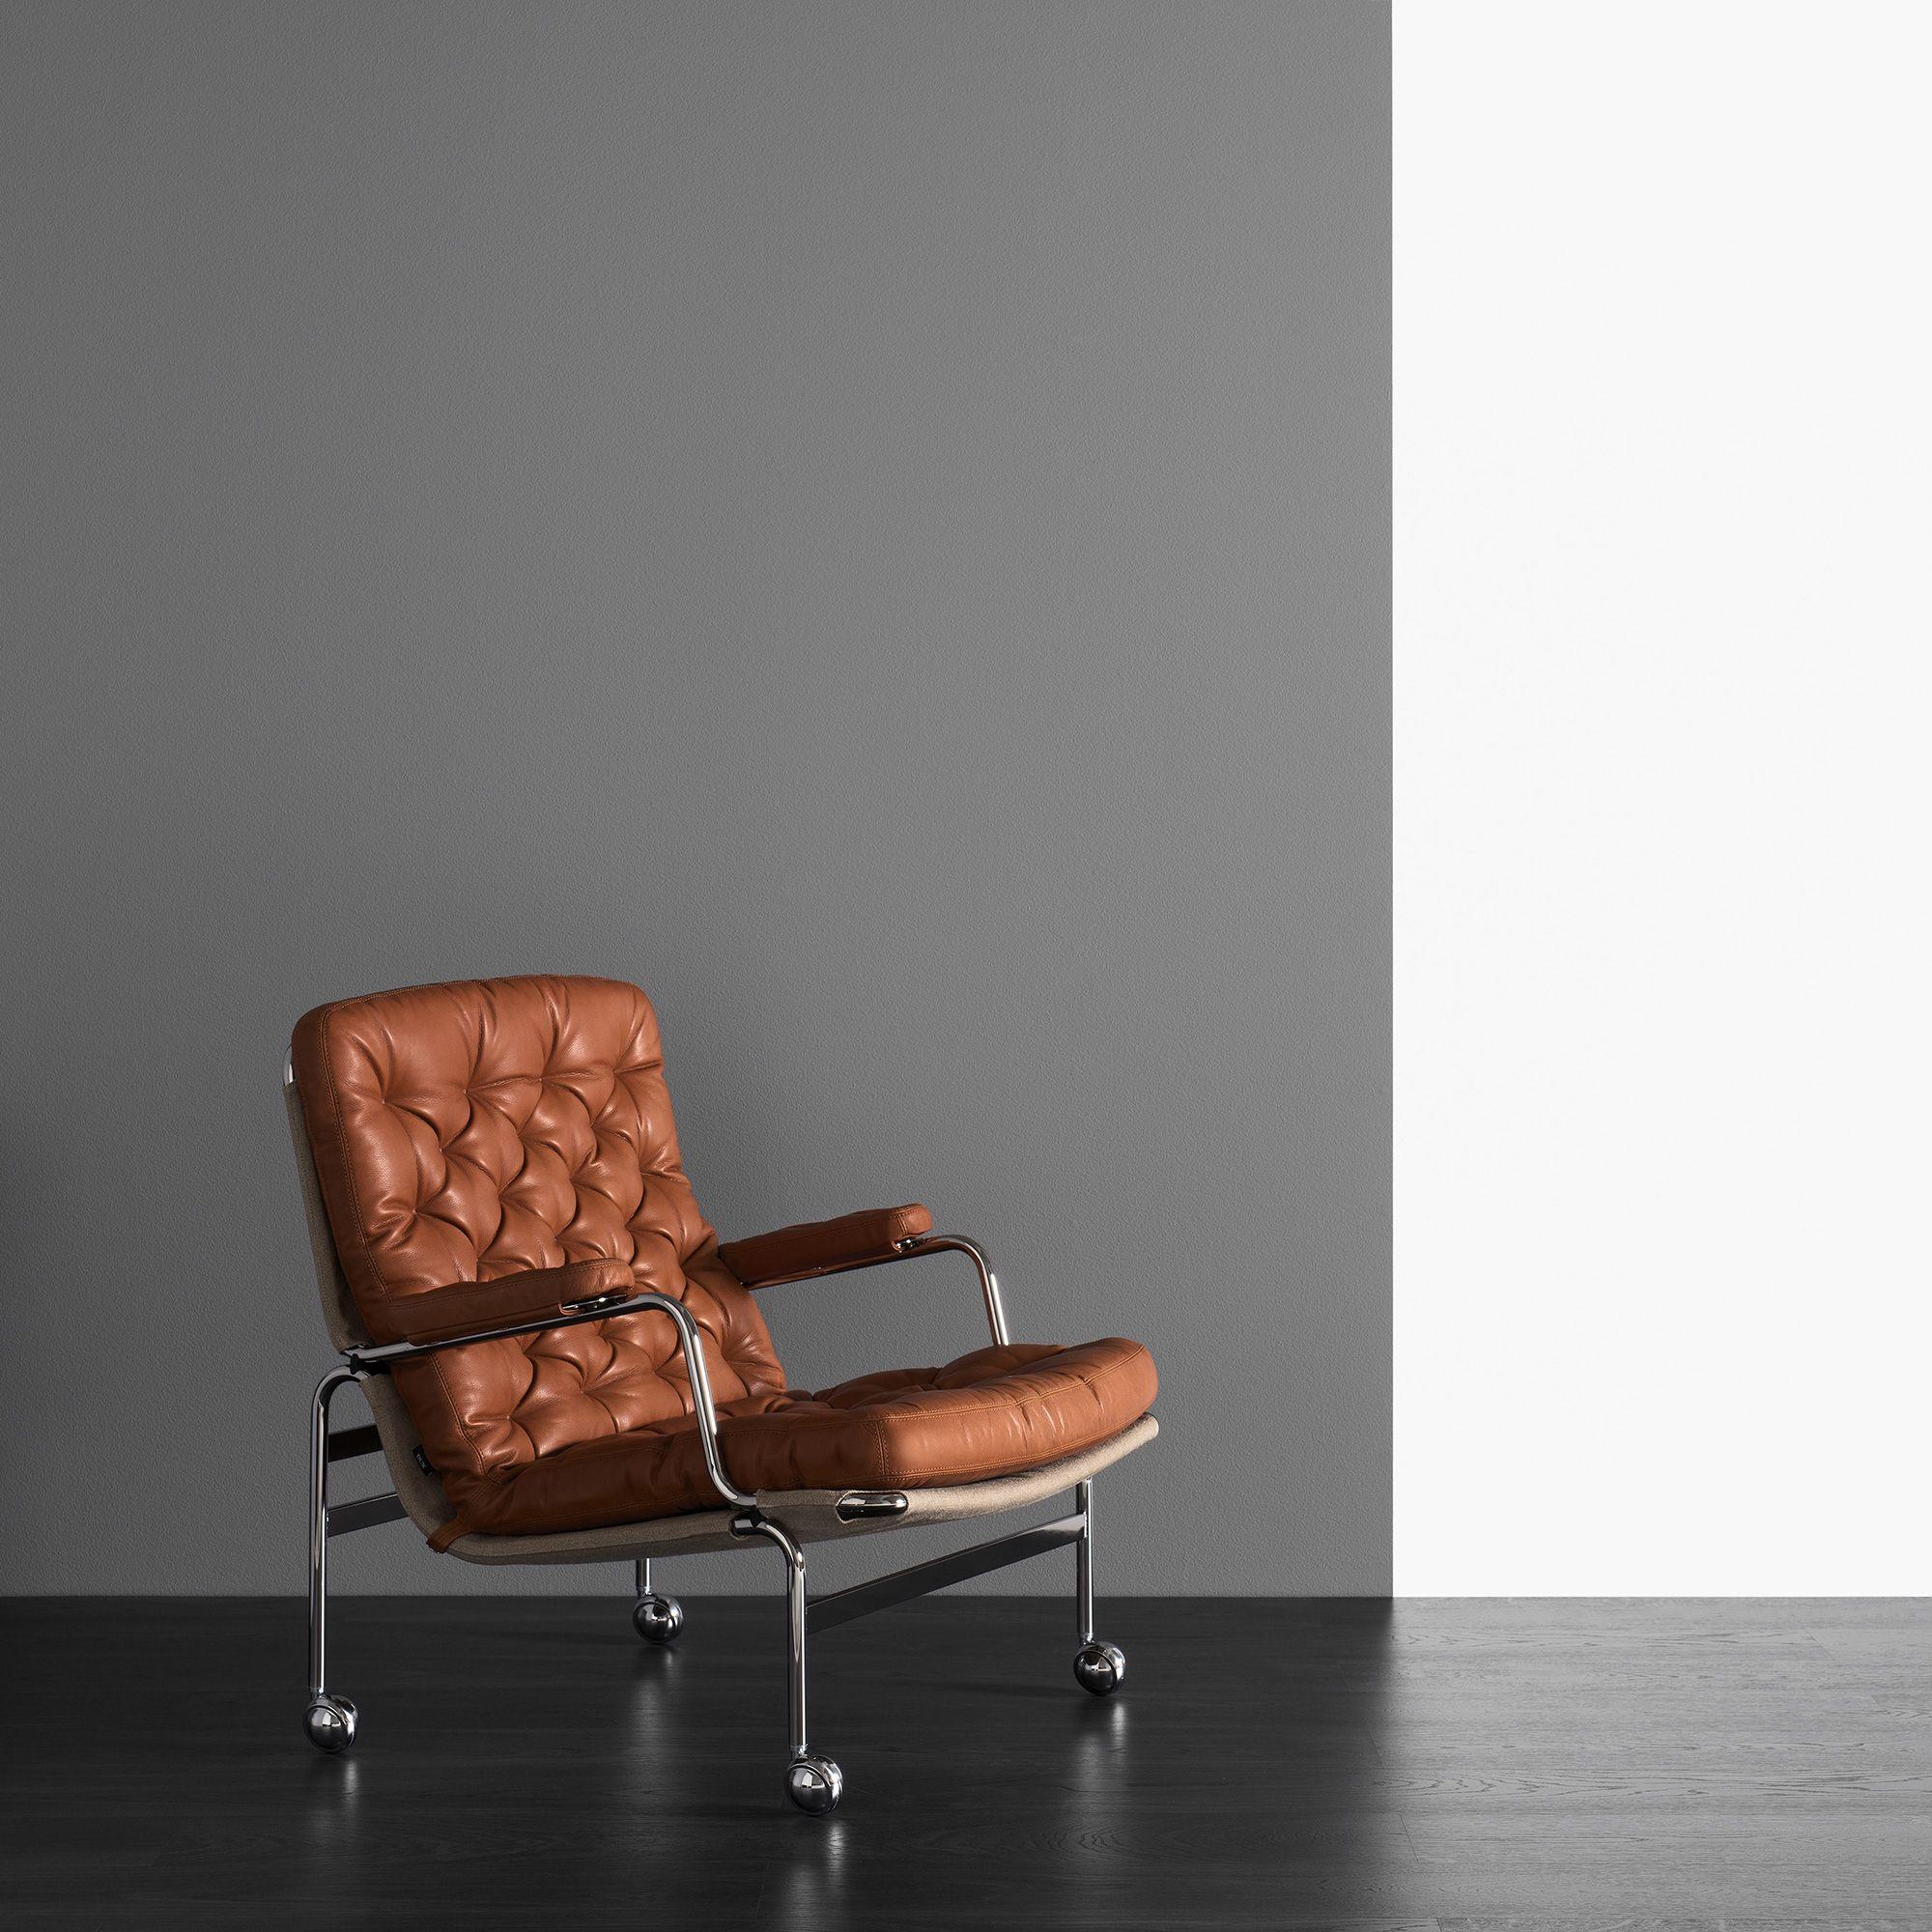 Karin 73 In 2020 Chair Furniture Home Decor